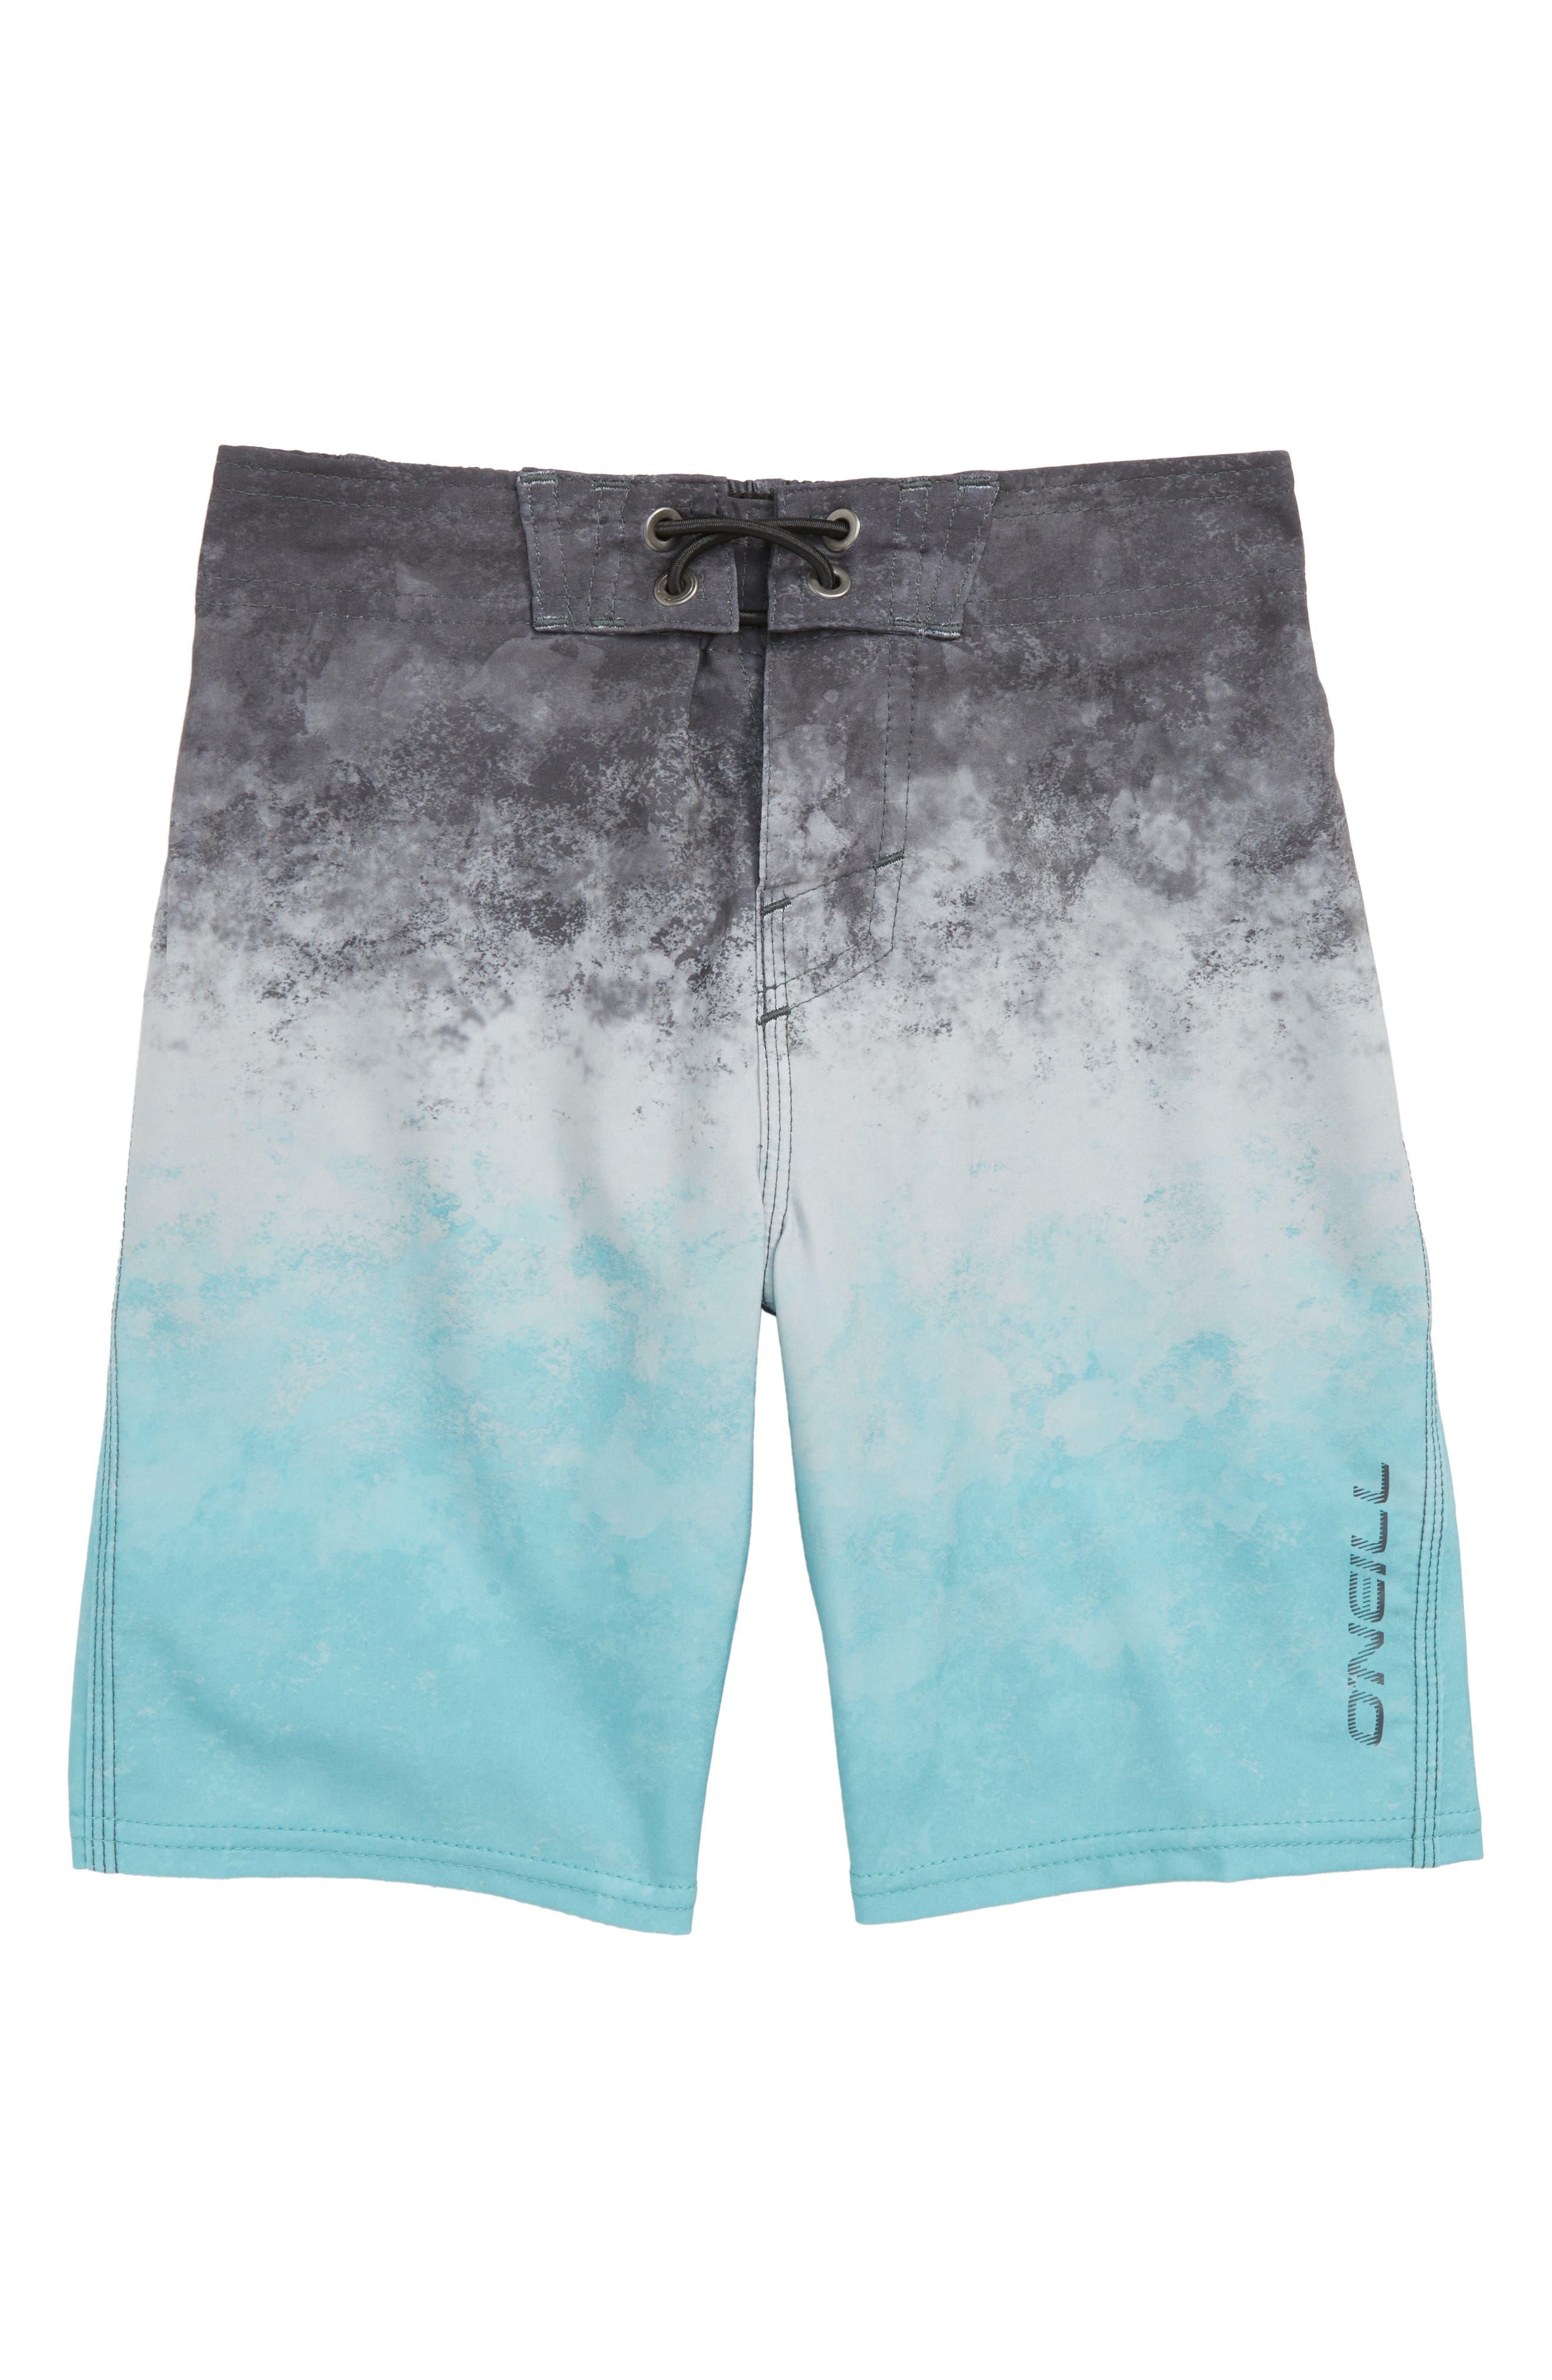 Sneakyfreak Surface Board Shorts,                             Main thumbnail 1, color,                             AQUA